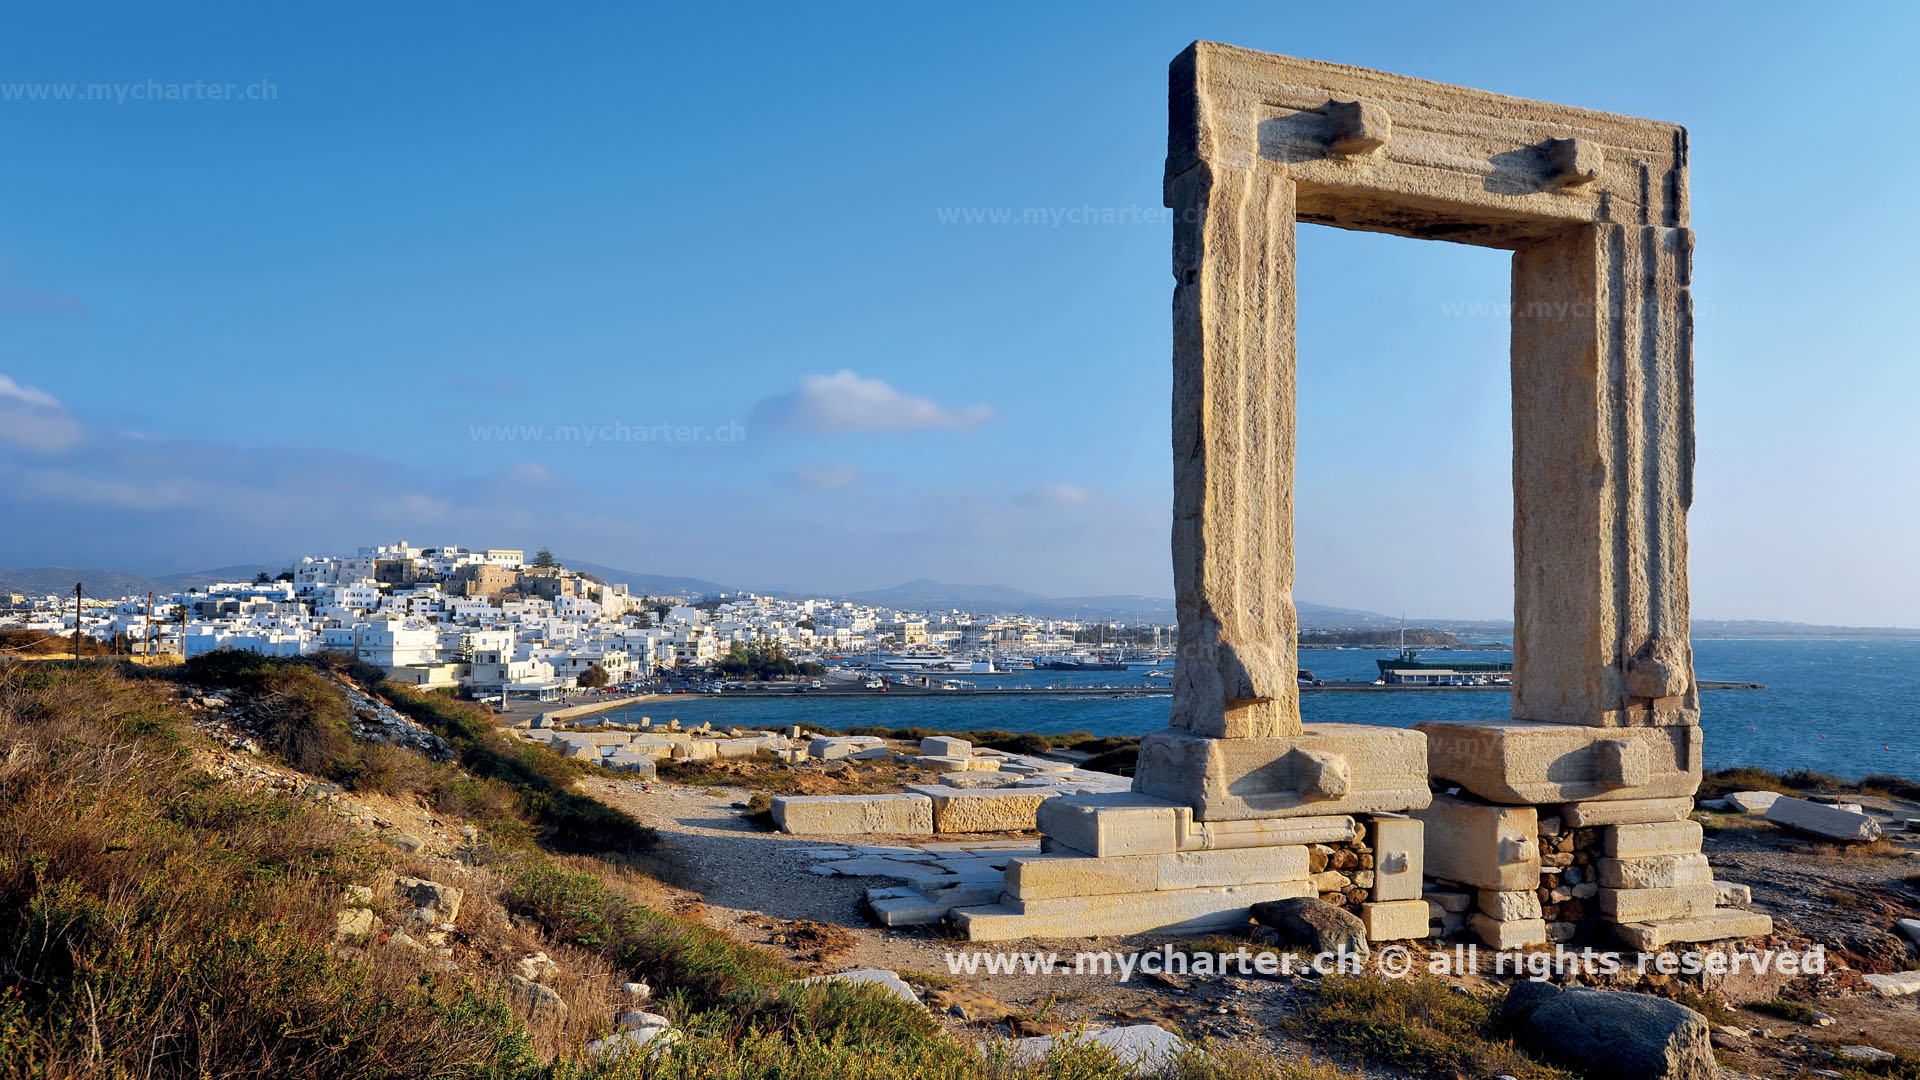 Griechenland - Naxos